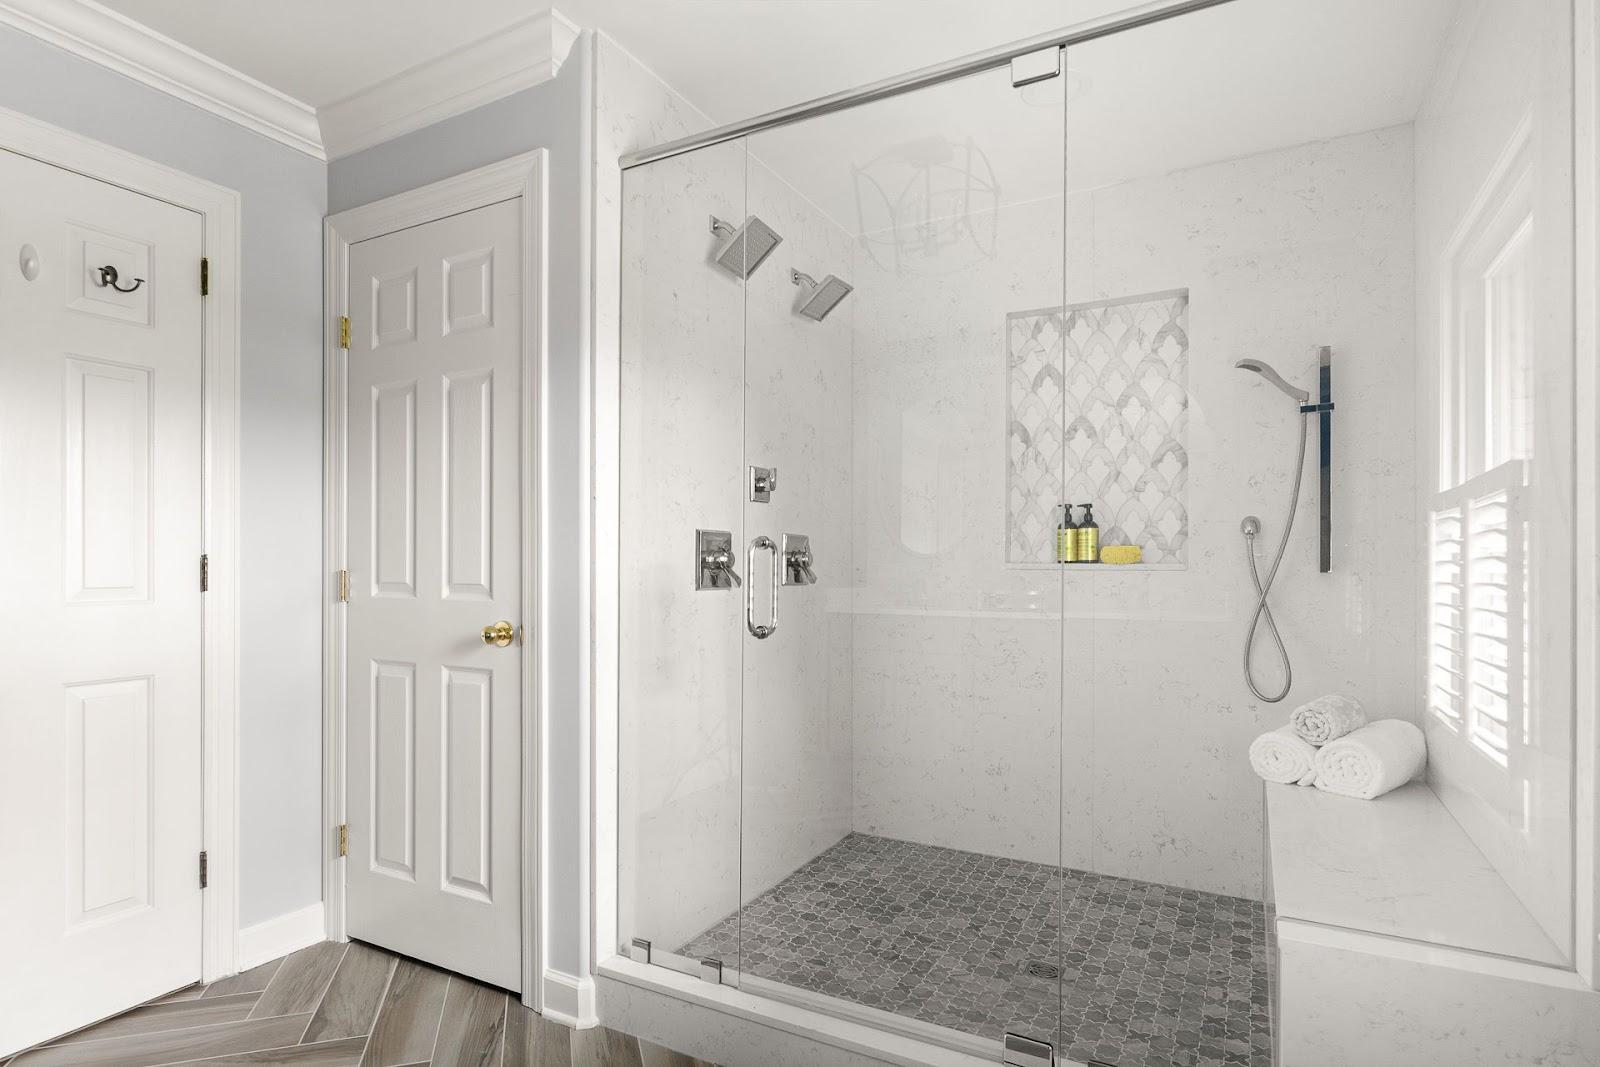 superior-construction-mt-juliet-tn-porcelain-vs-ceramic-bathroom-with-glass-shower-door-and-bench-tiled